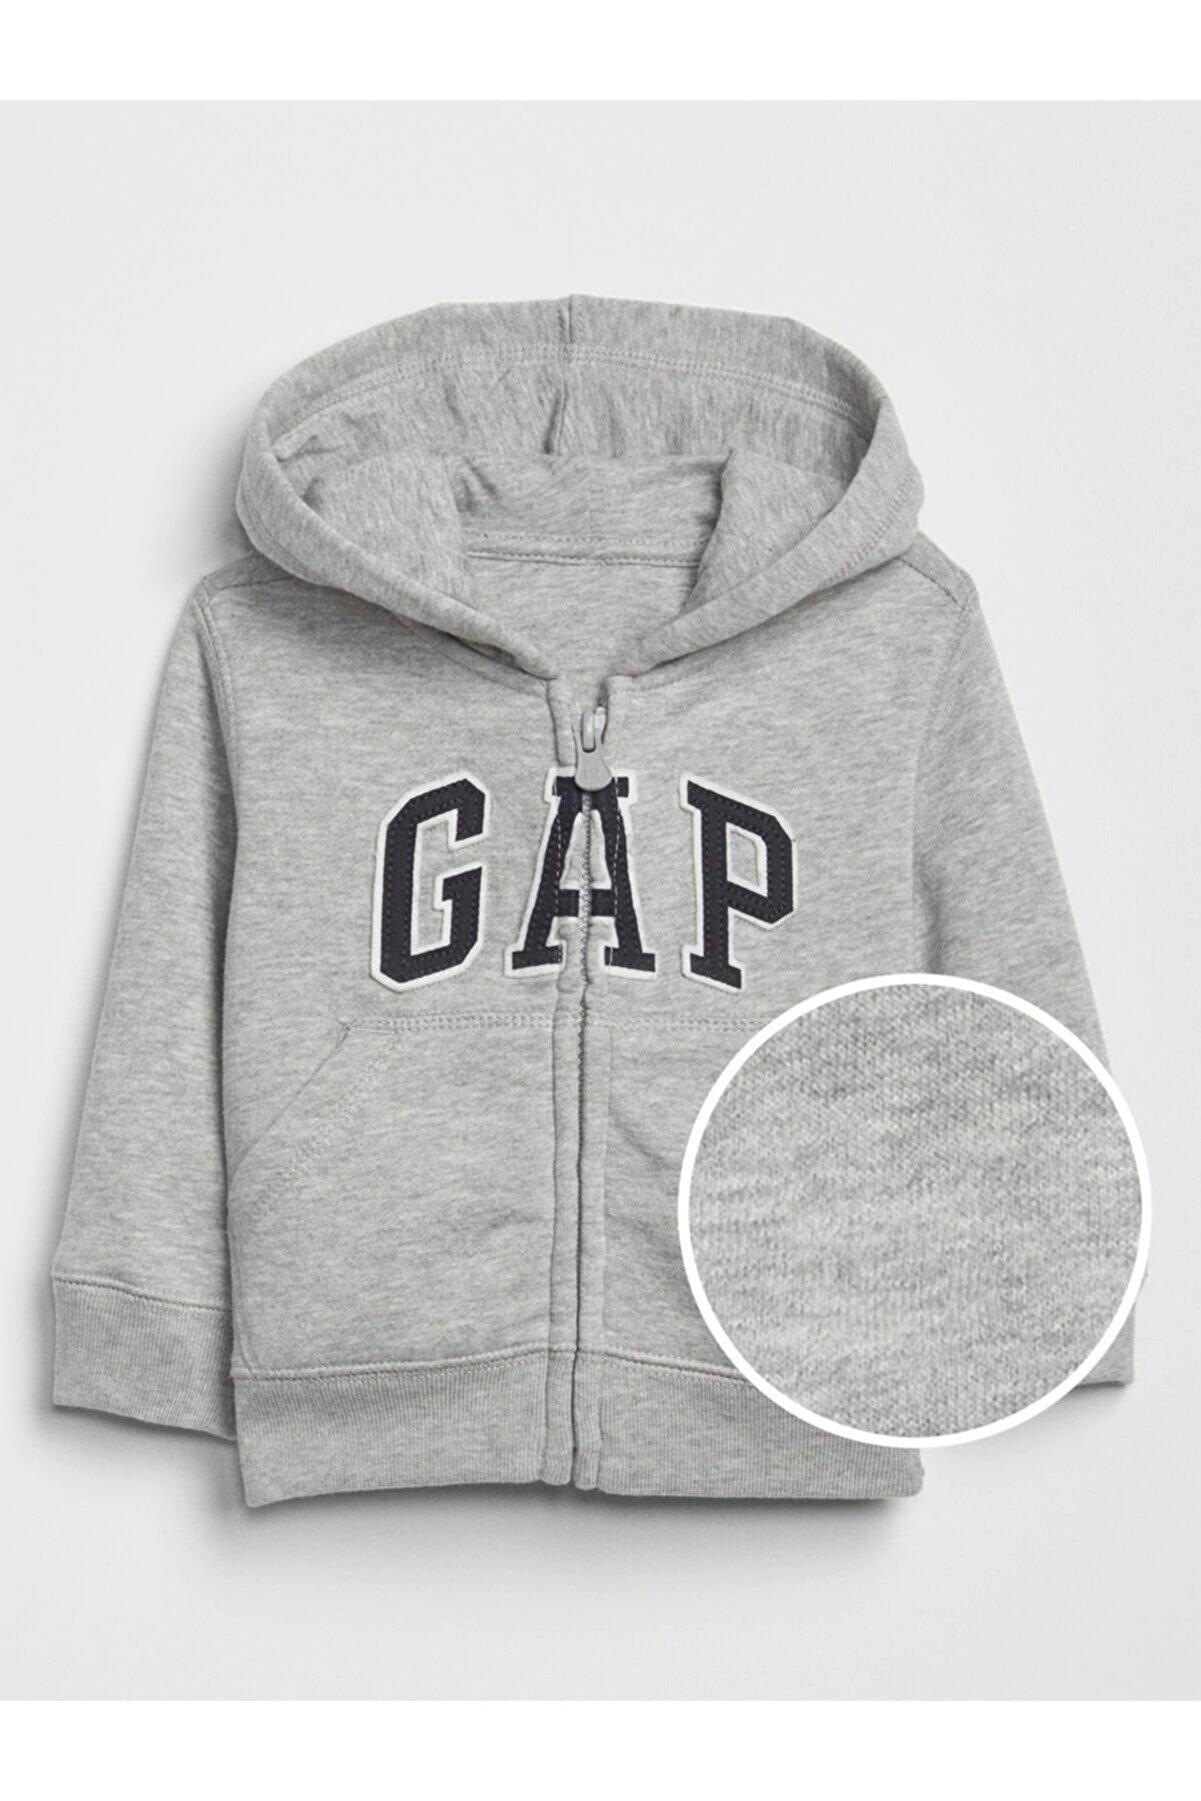 GAP Erkek Çocuk Gri Logo Kapüşonlu Sweatshirt